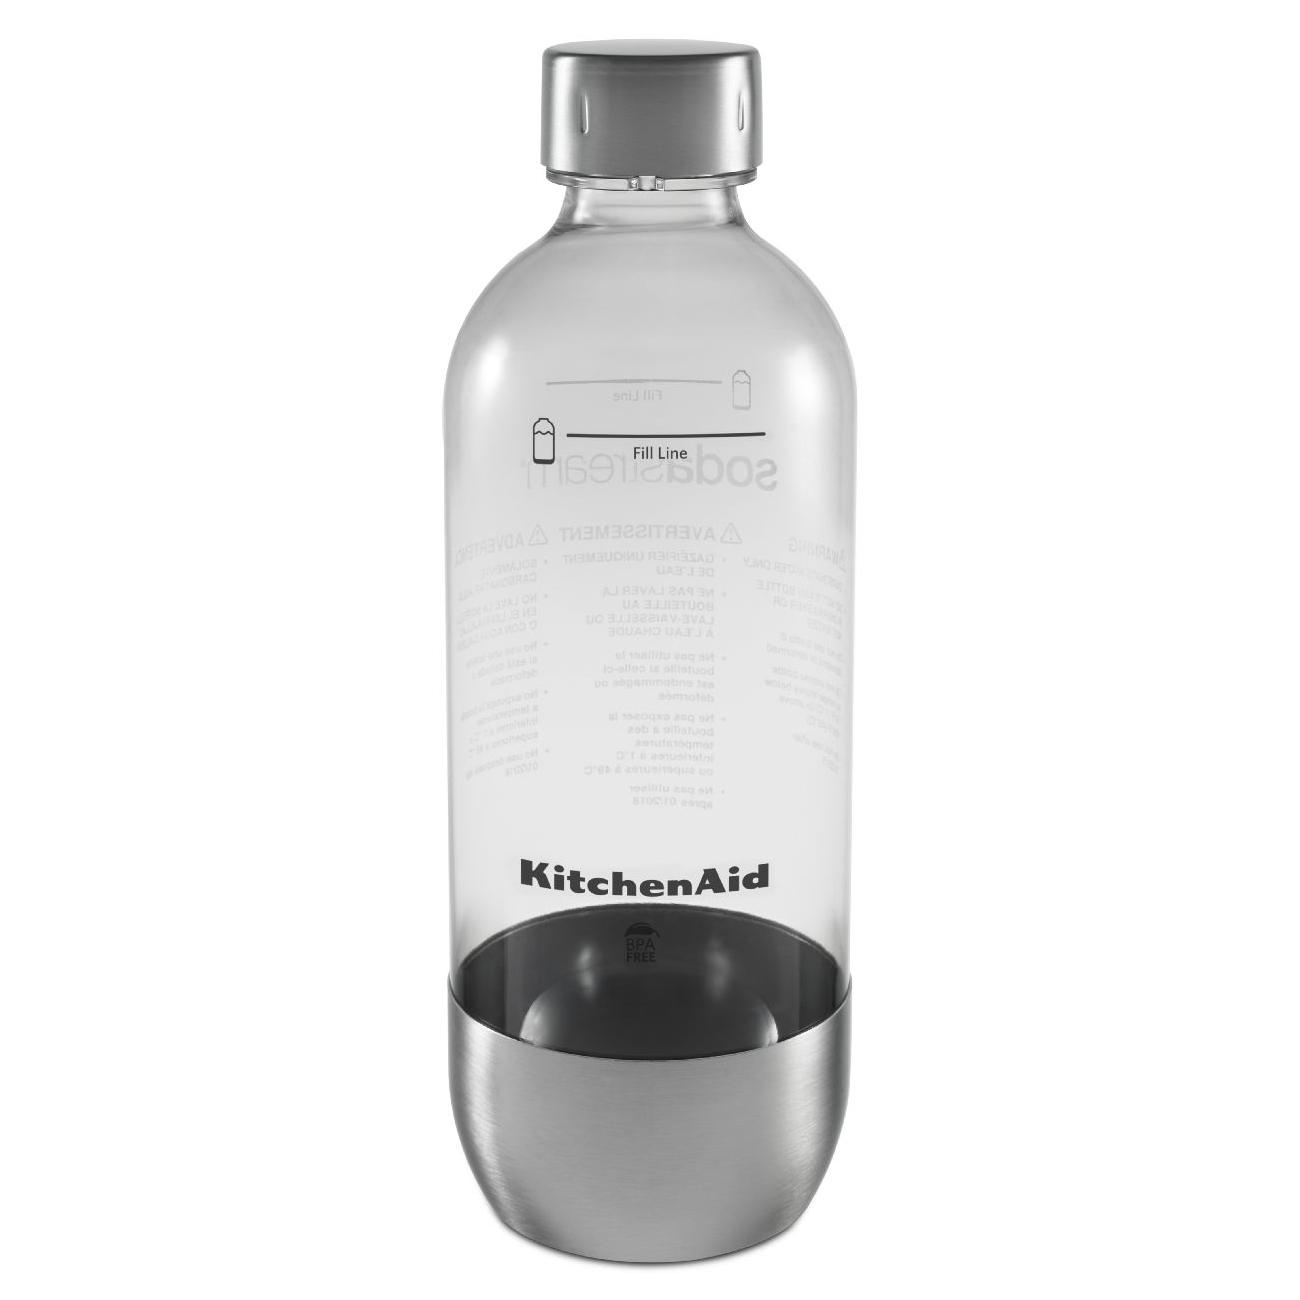 KitchenAid SodaStream Stainless Steel Reusable Carbonating Bottle for Sparkling Beverage Maker